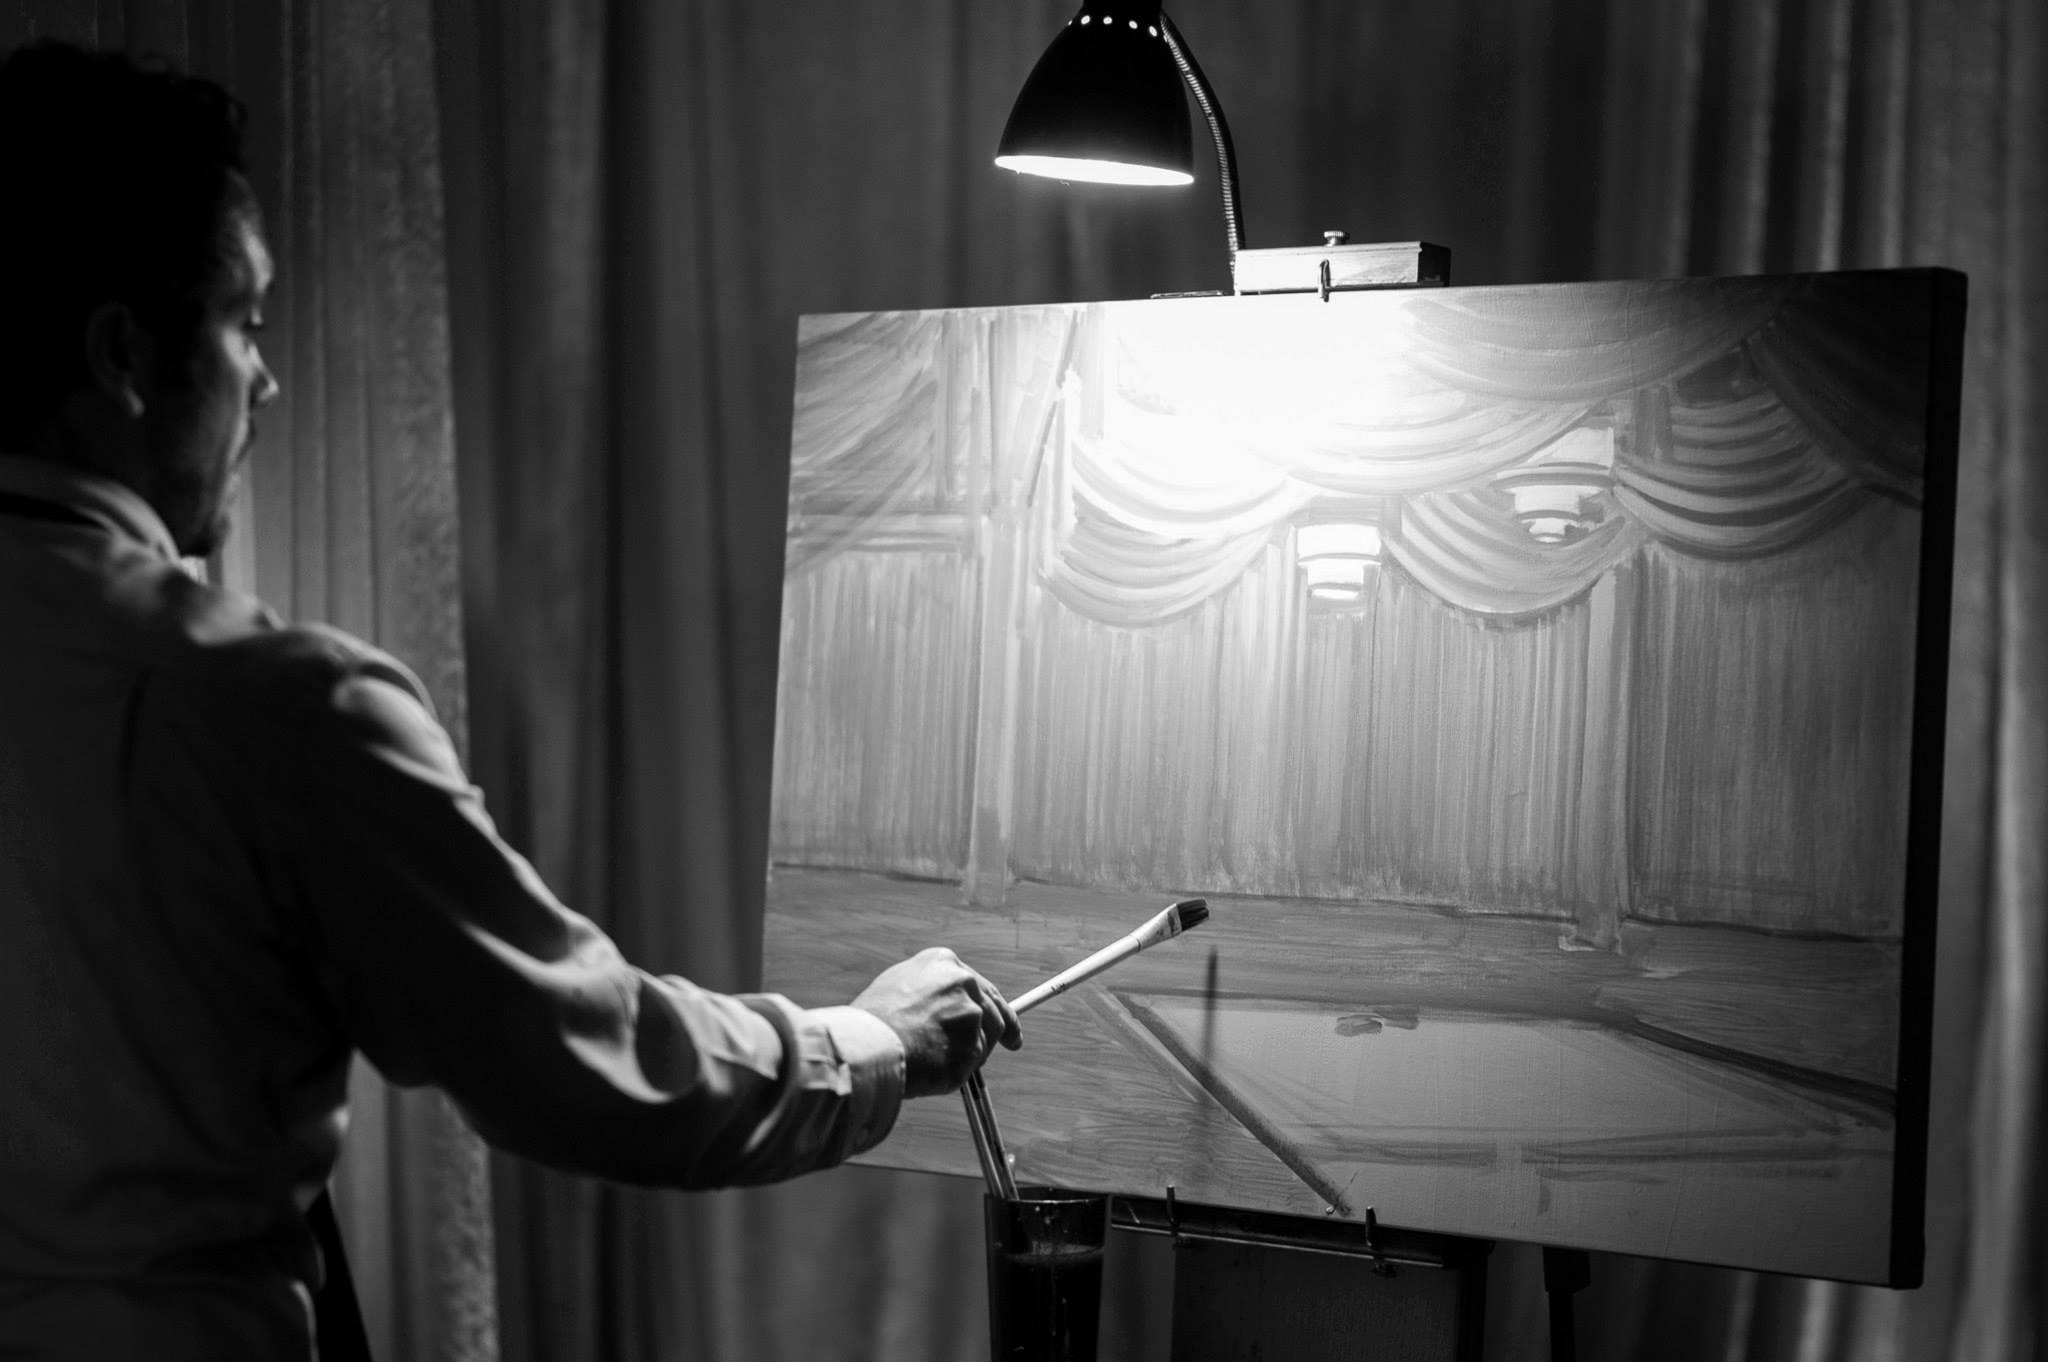 florida-wedding-painter-wed-on-canvas-miami-live-wedding-painting